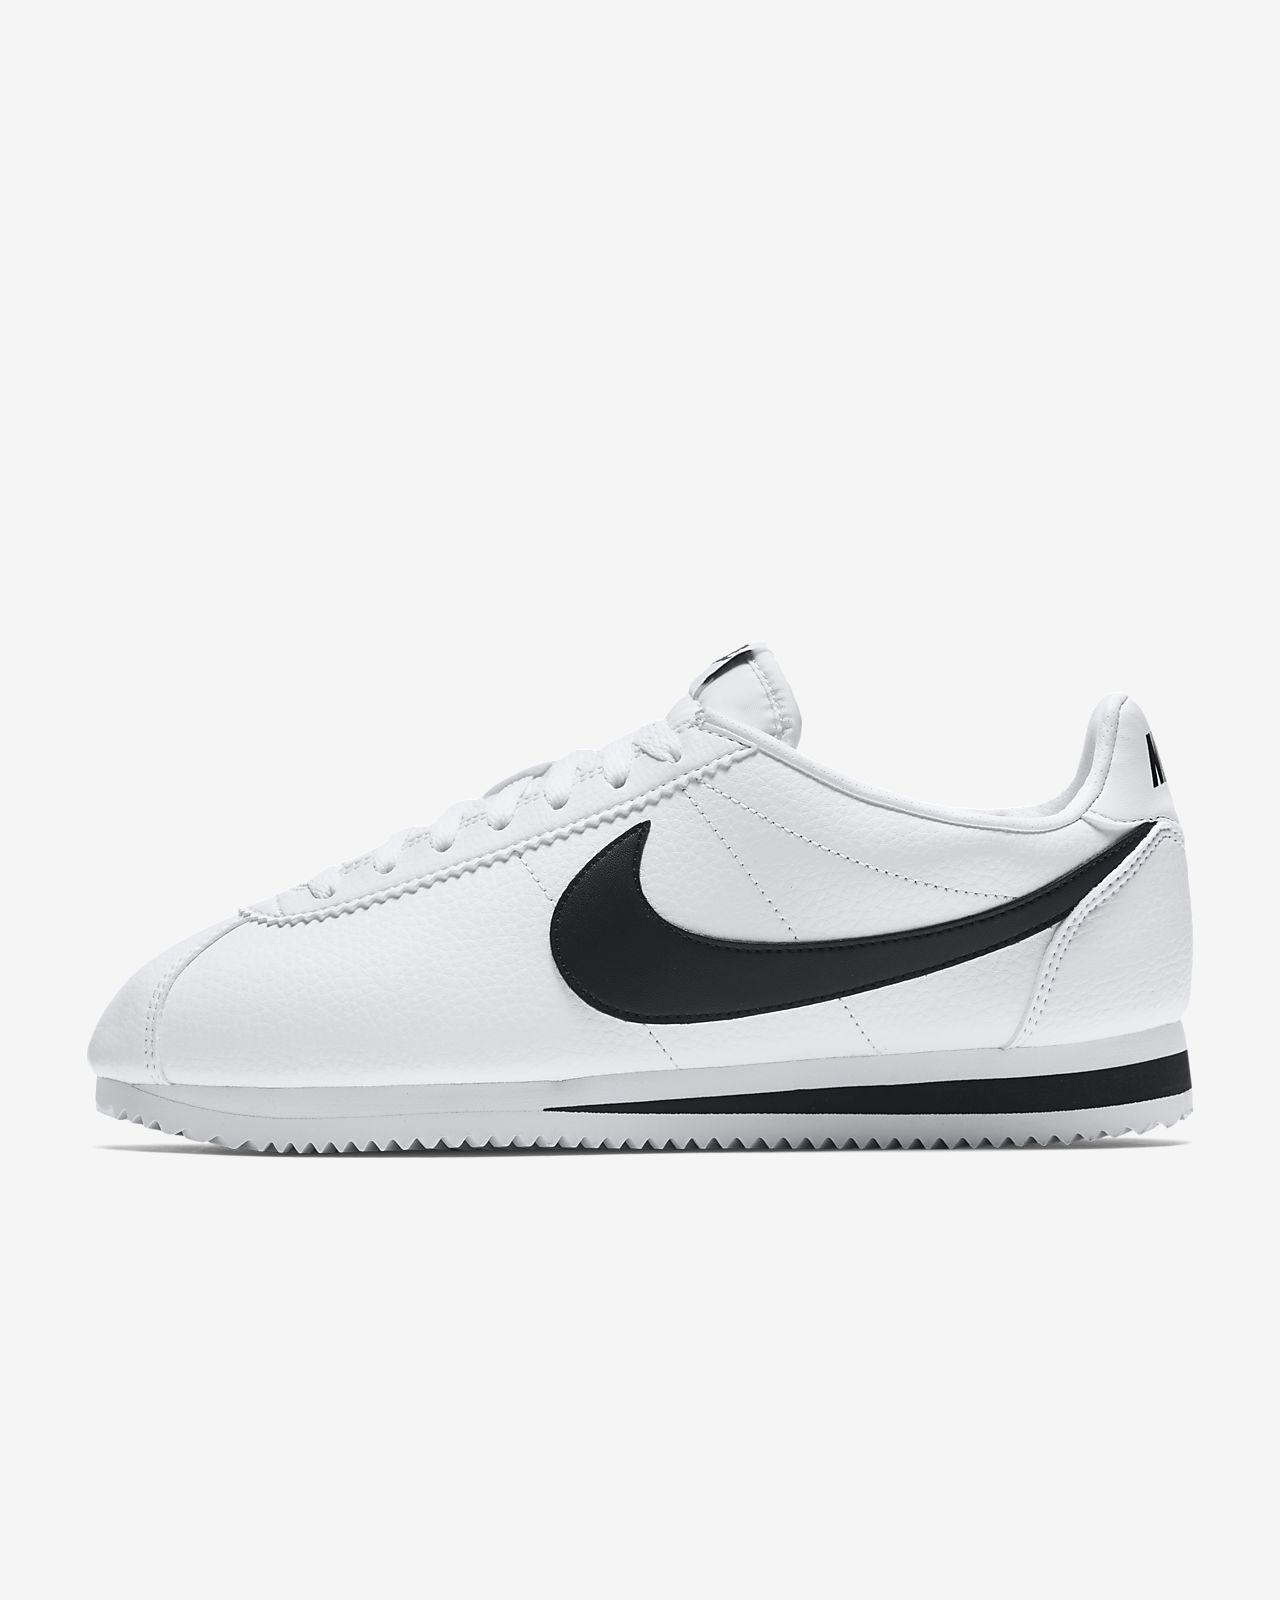 Sko Nike Classic Cortez för män